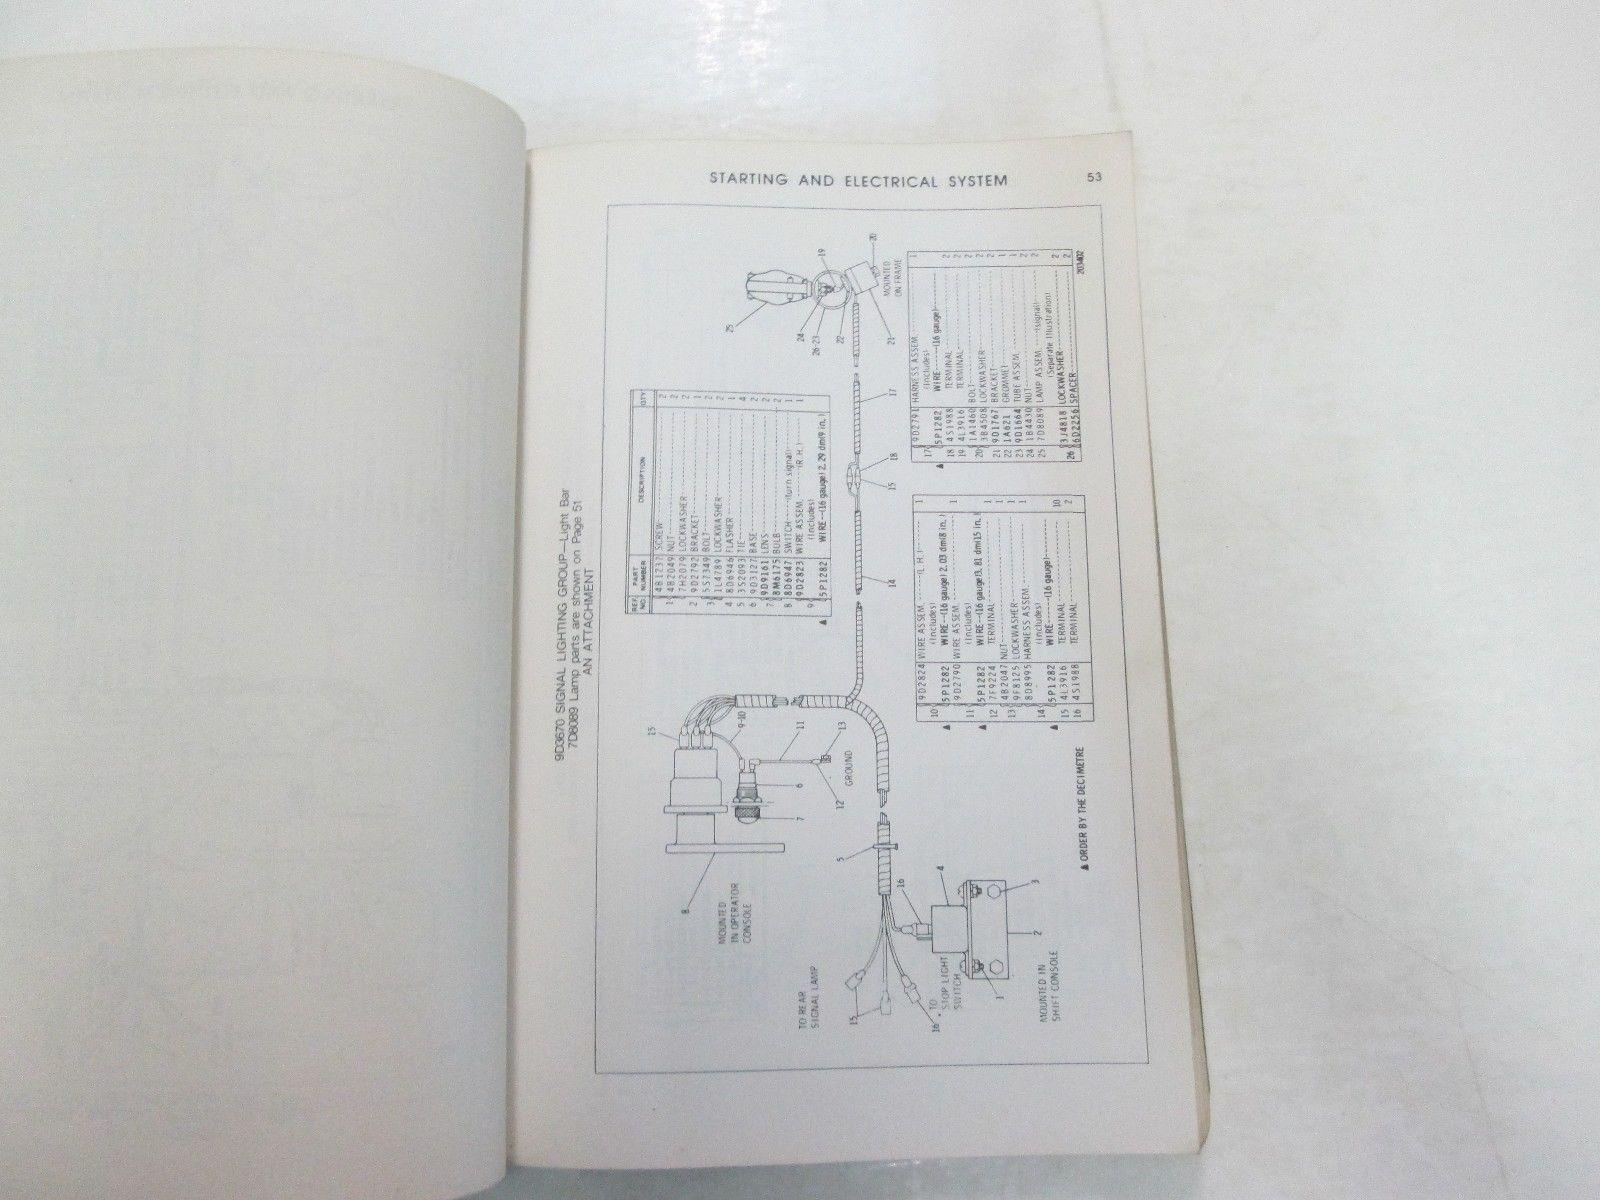 Manual cat 120g motor grader caterpillar 120g array caterpillar 120g motor grader parts book and 50 similar items rh bonanza com fandeluxe Images